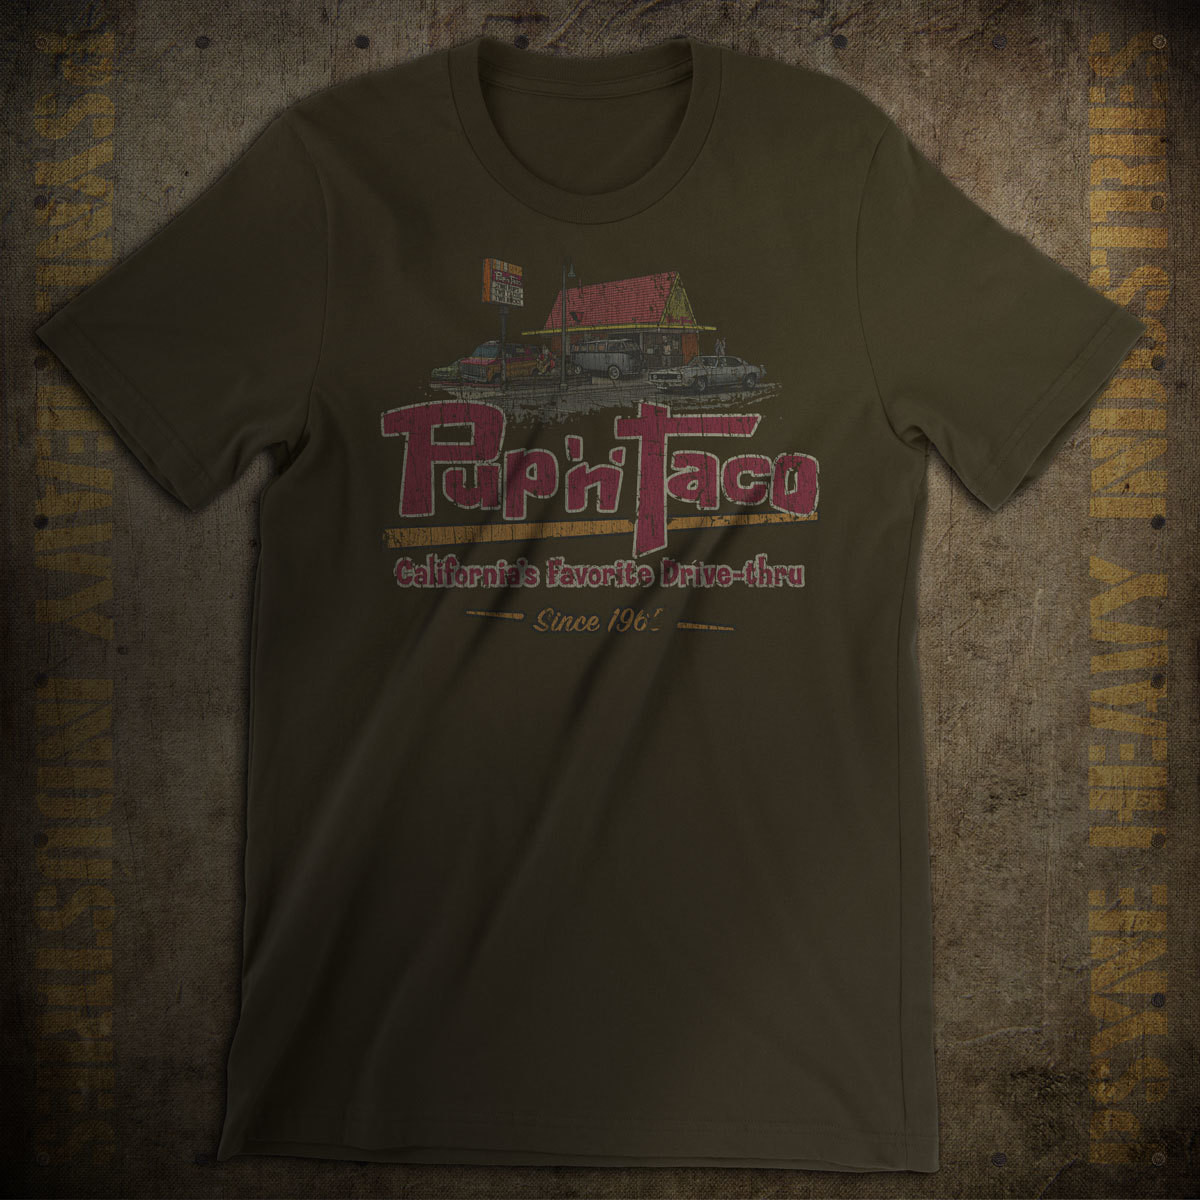 Pup 'n' Taco Drive-Thru Vintage T-Shirt